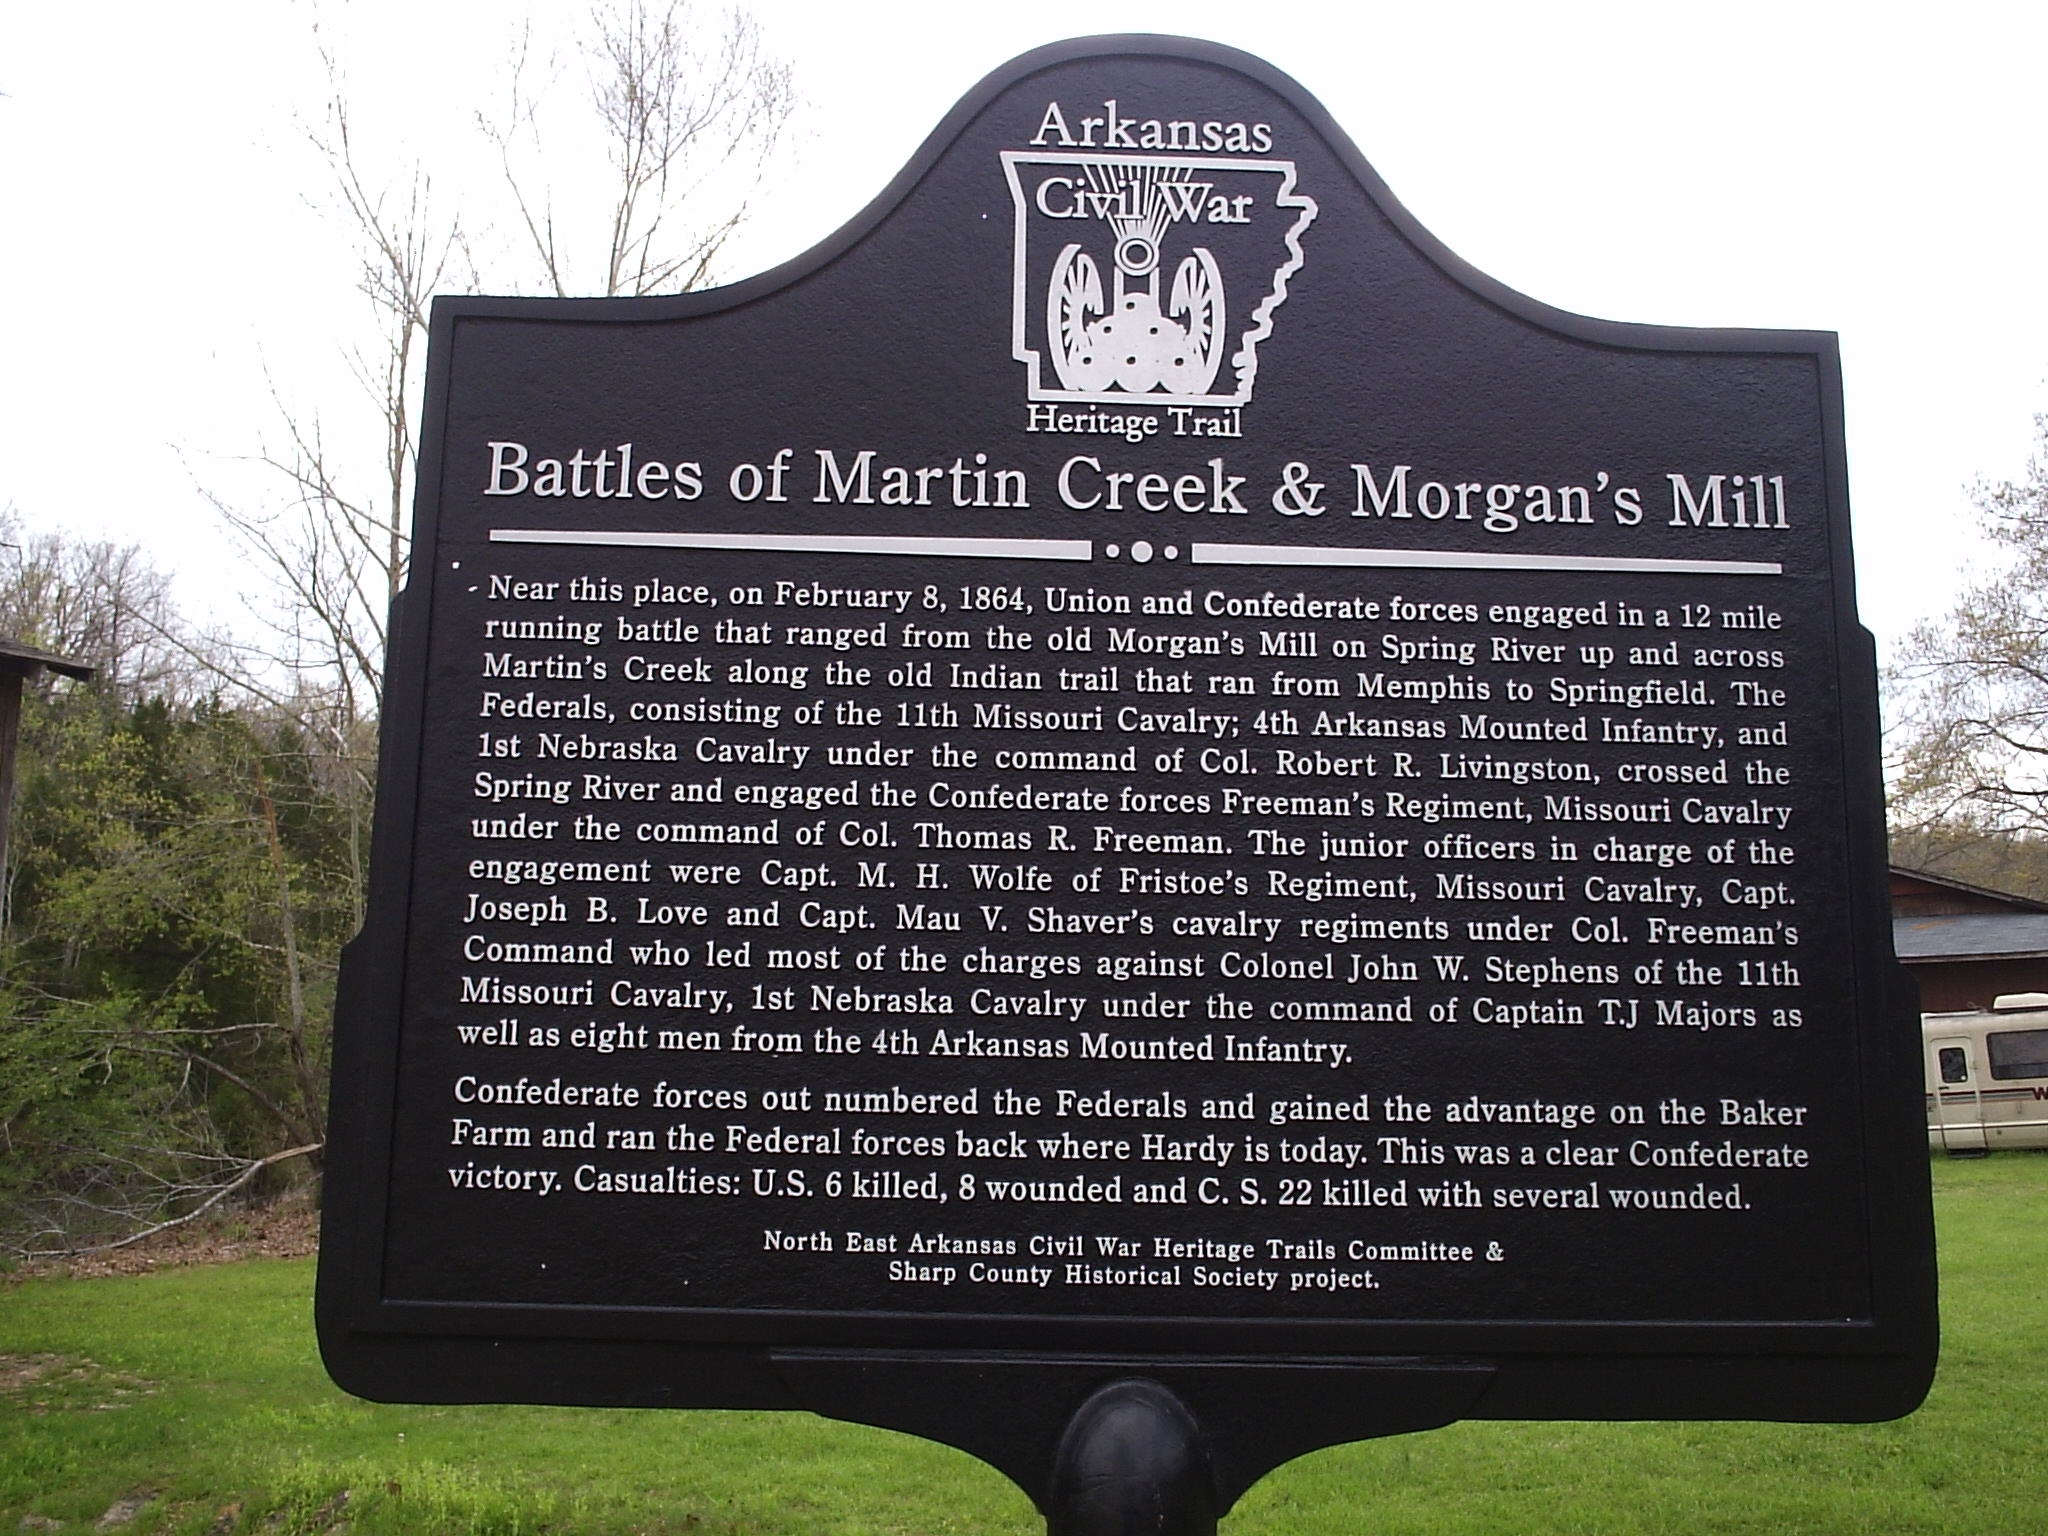 Historical marker erected in 2004.